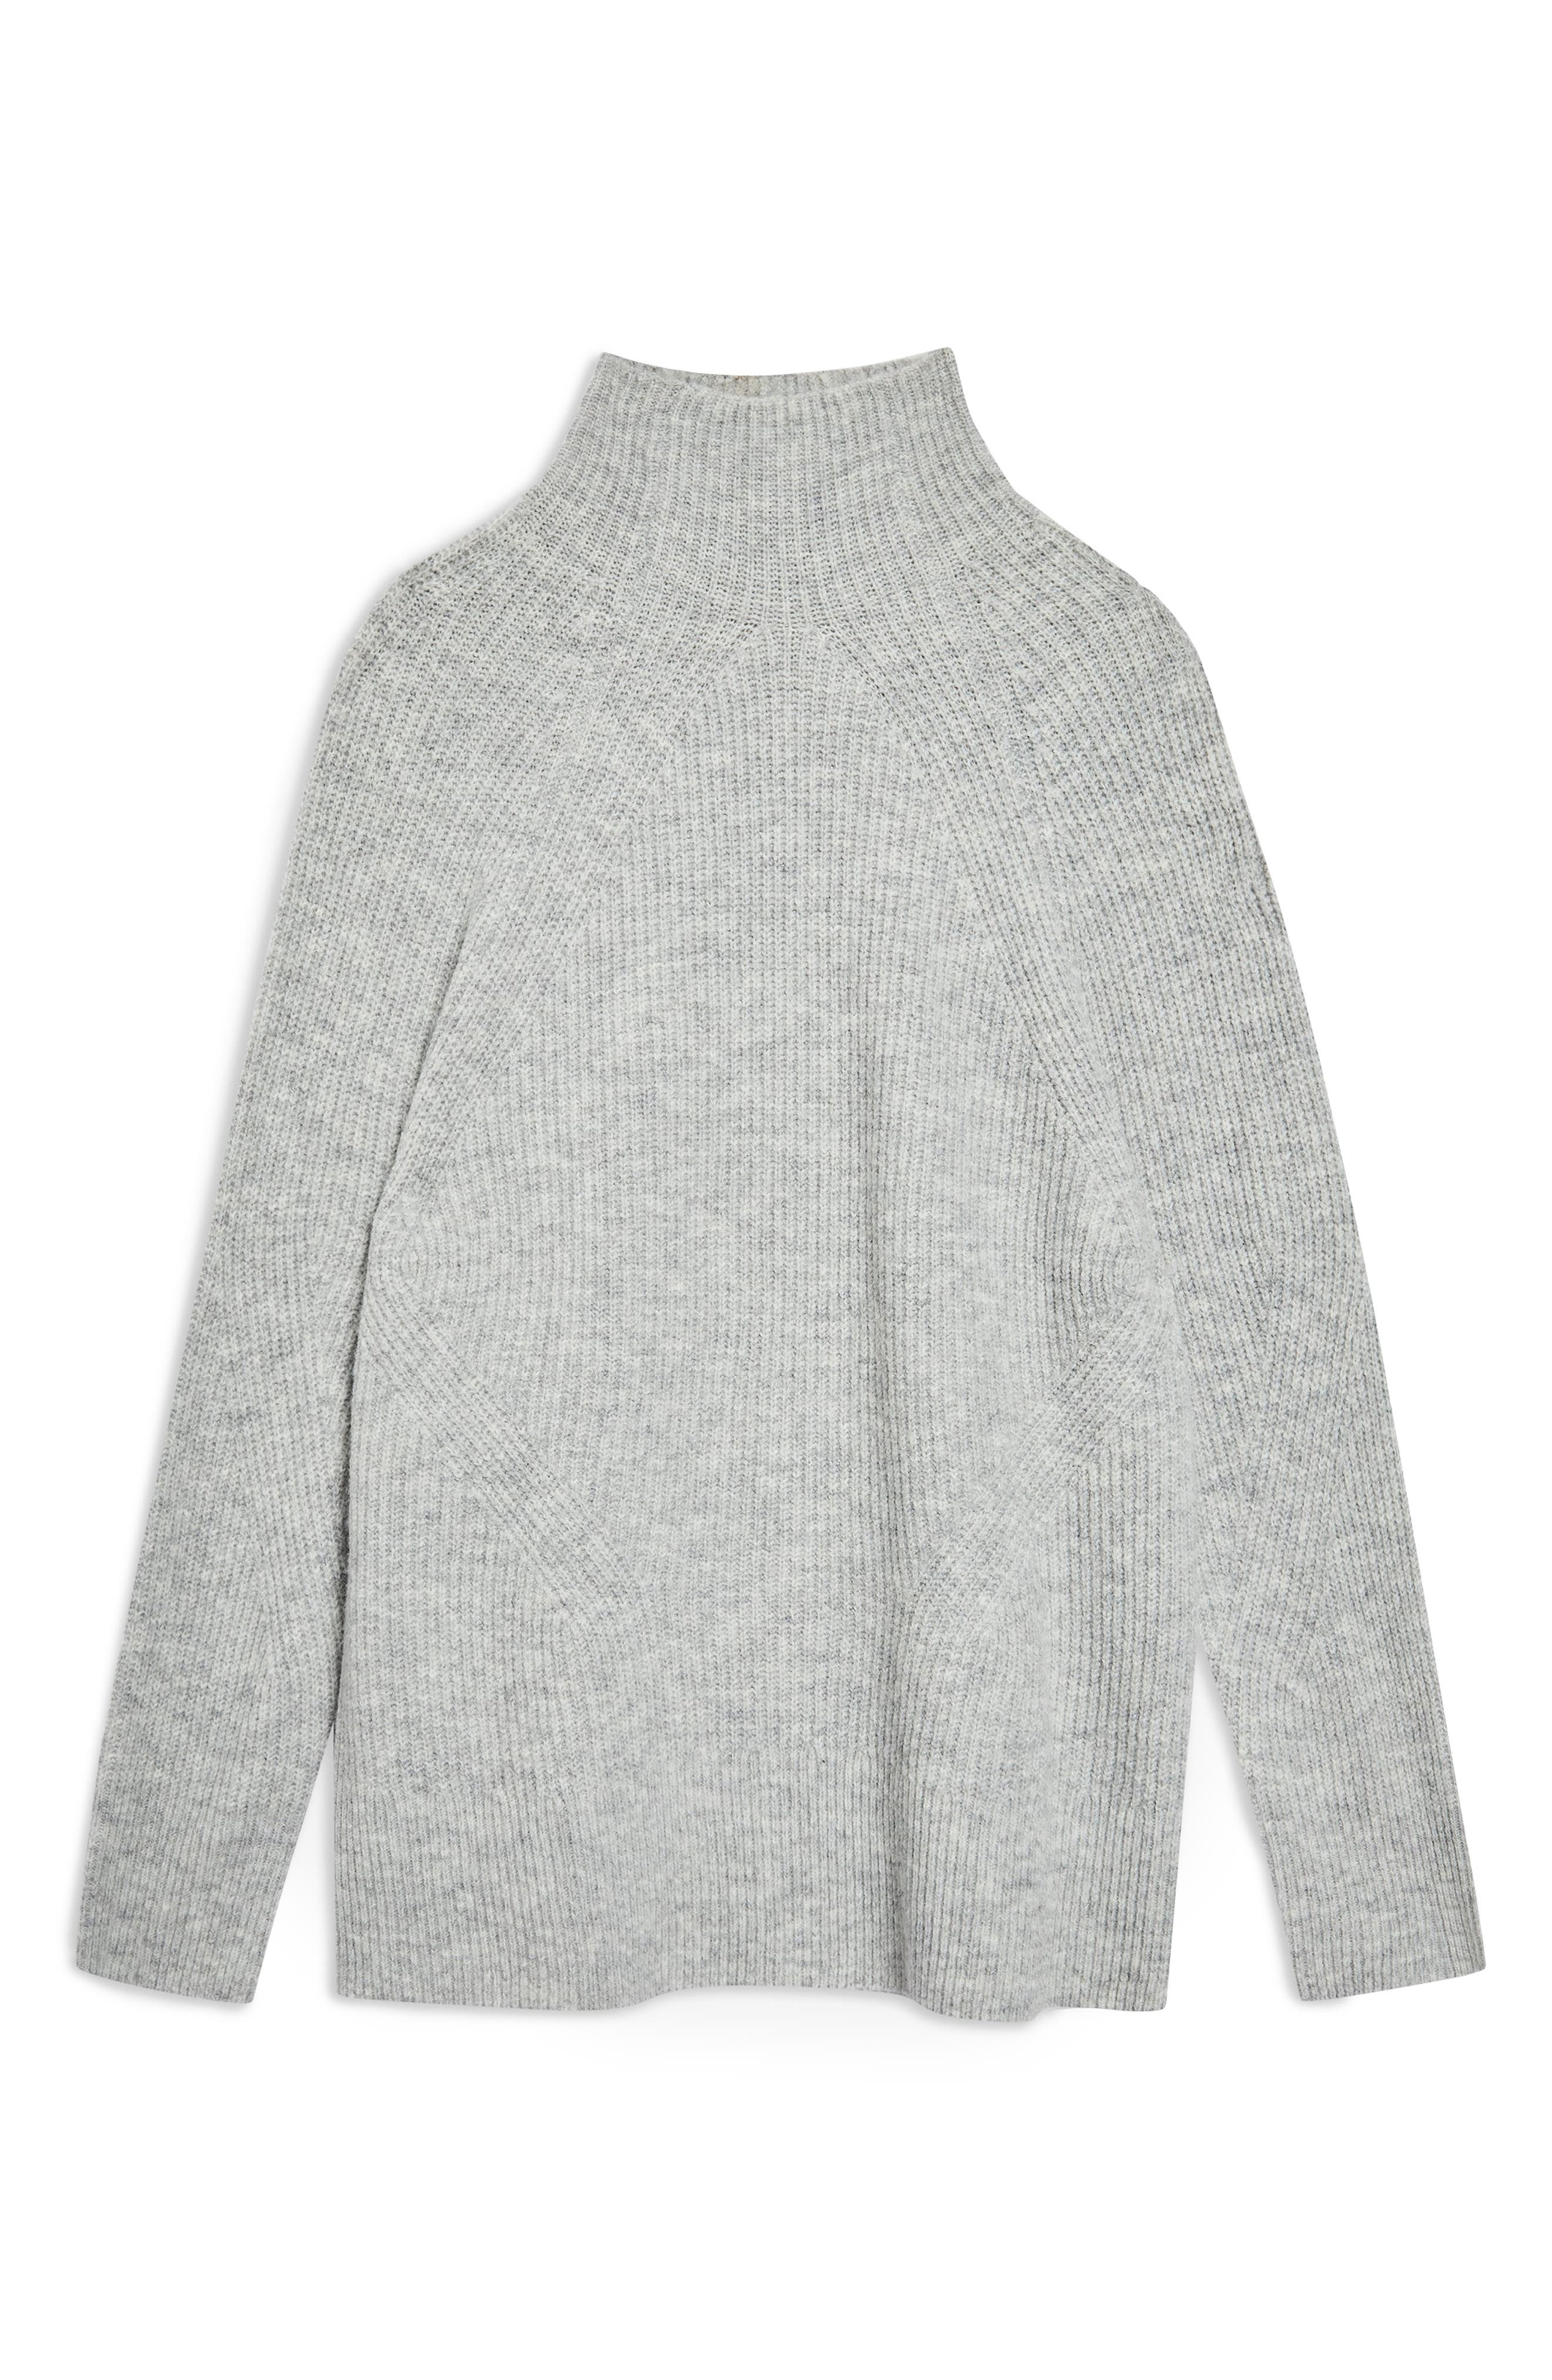 Raglan Turtleneck Neck Sweater,                             Alternate thumbnail 3, color,                             GREY MARL